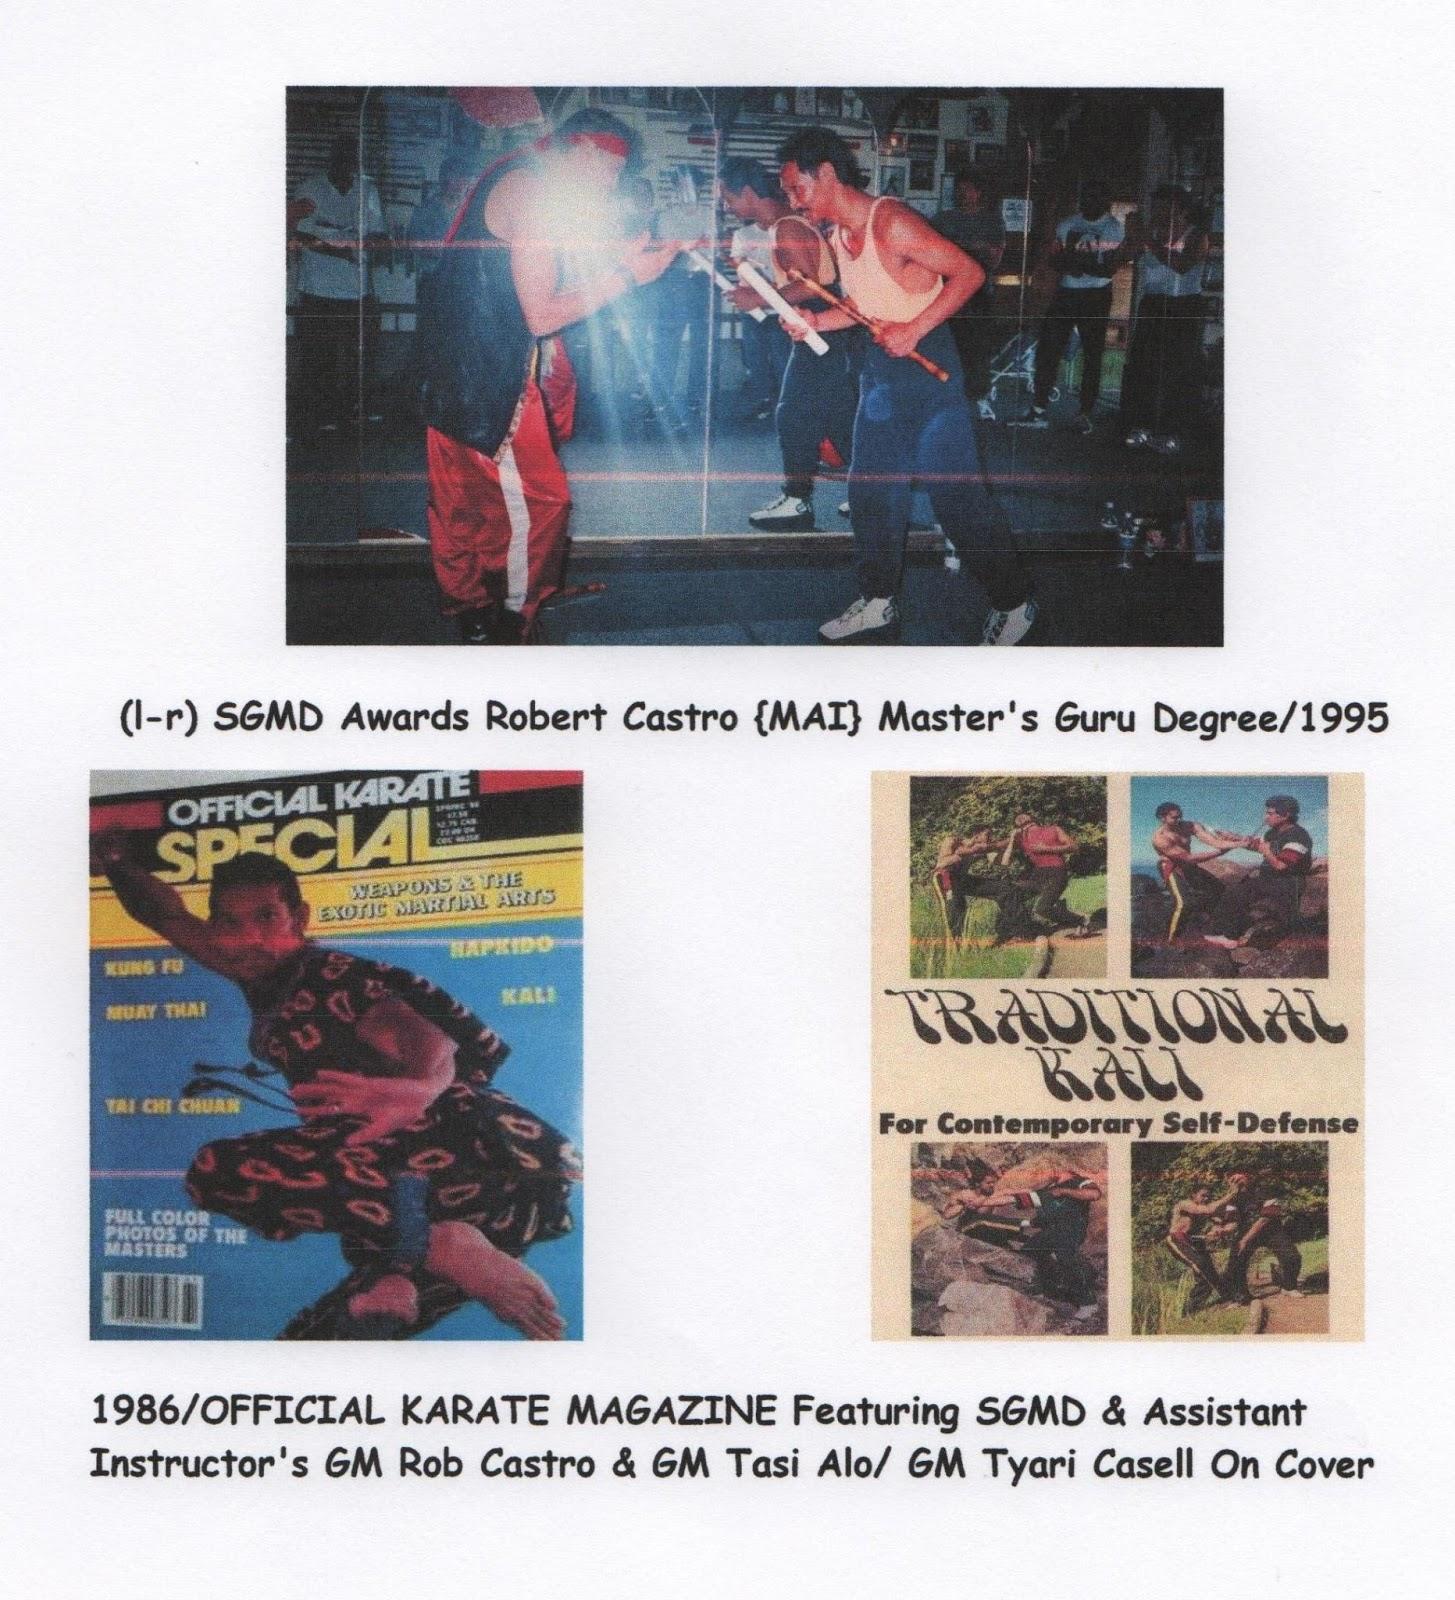 Filipino Martial Arts Adventures - Magazine cover